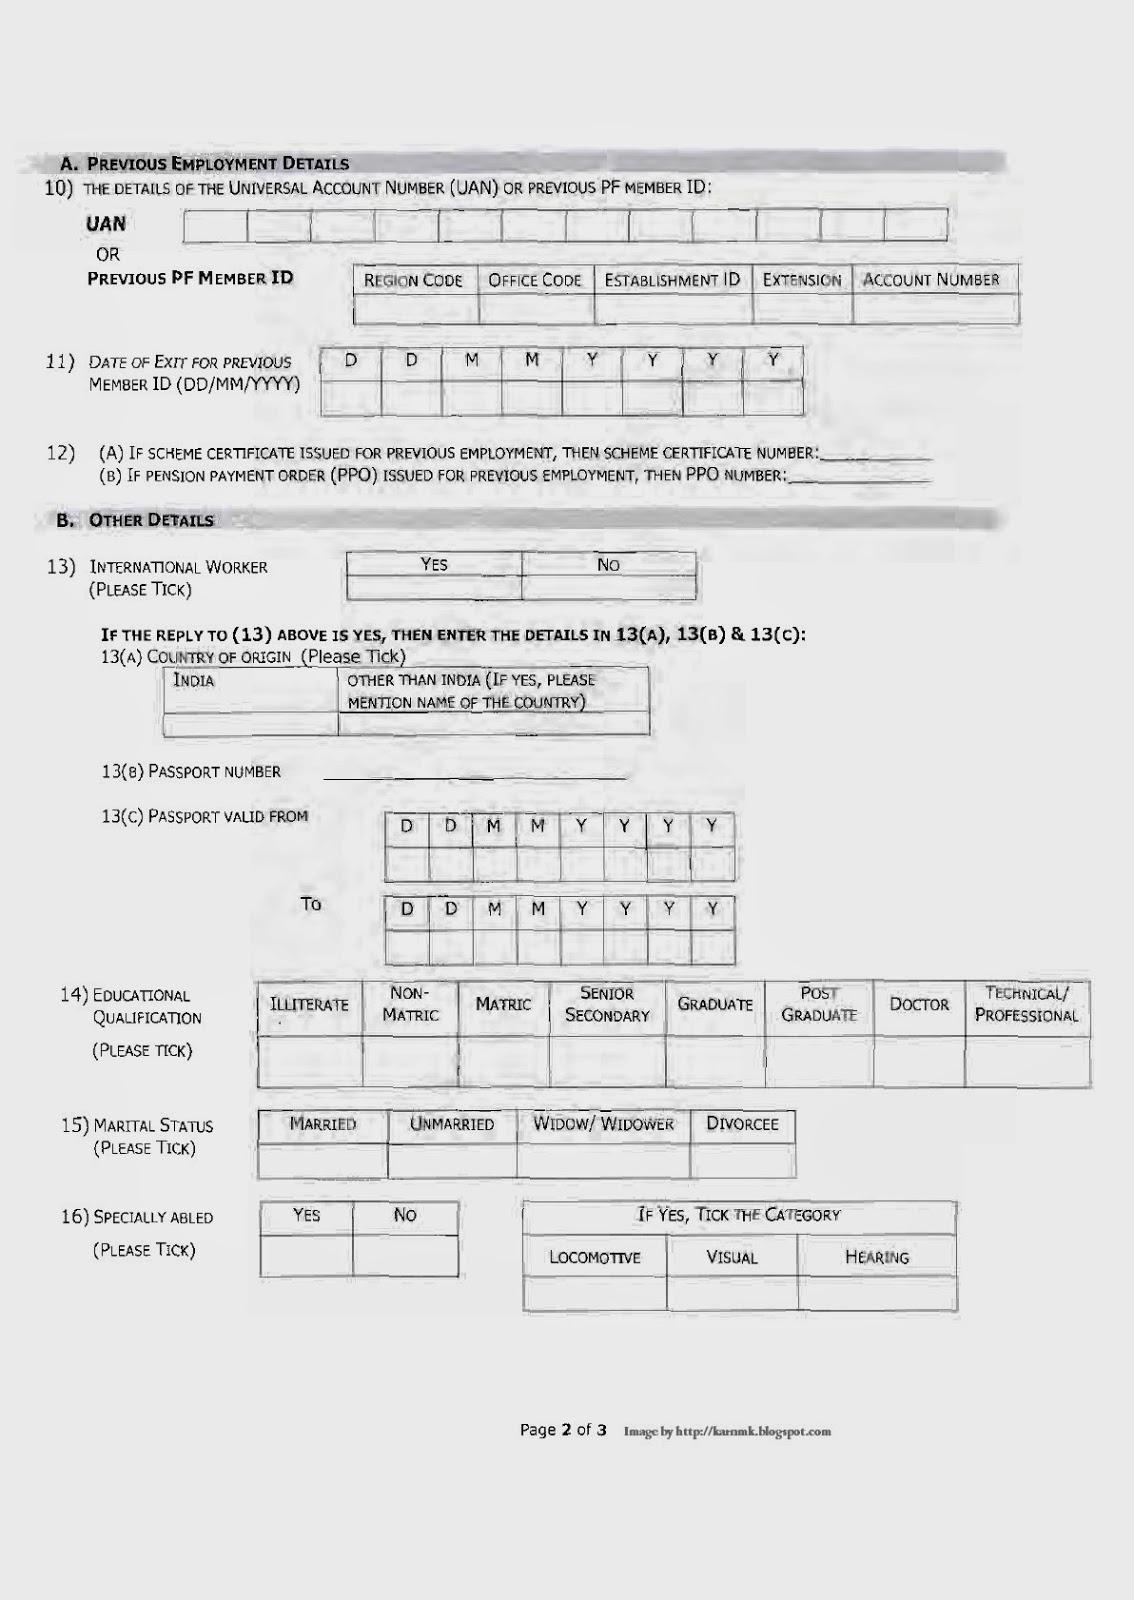 EPFO Introduction of Declaration Form Form No 11 New – Employee Declaration Form